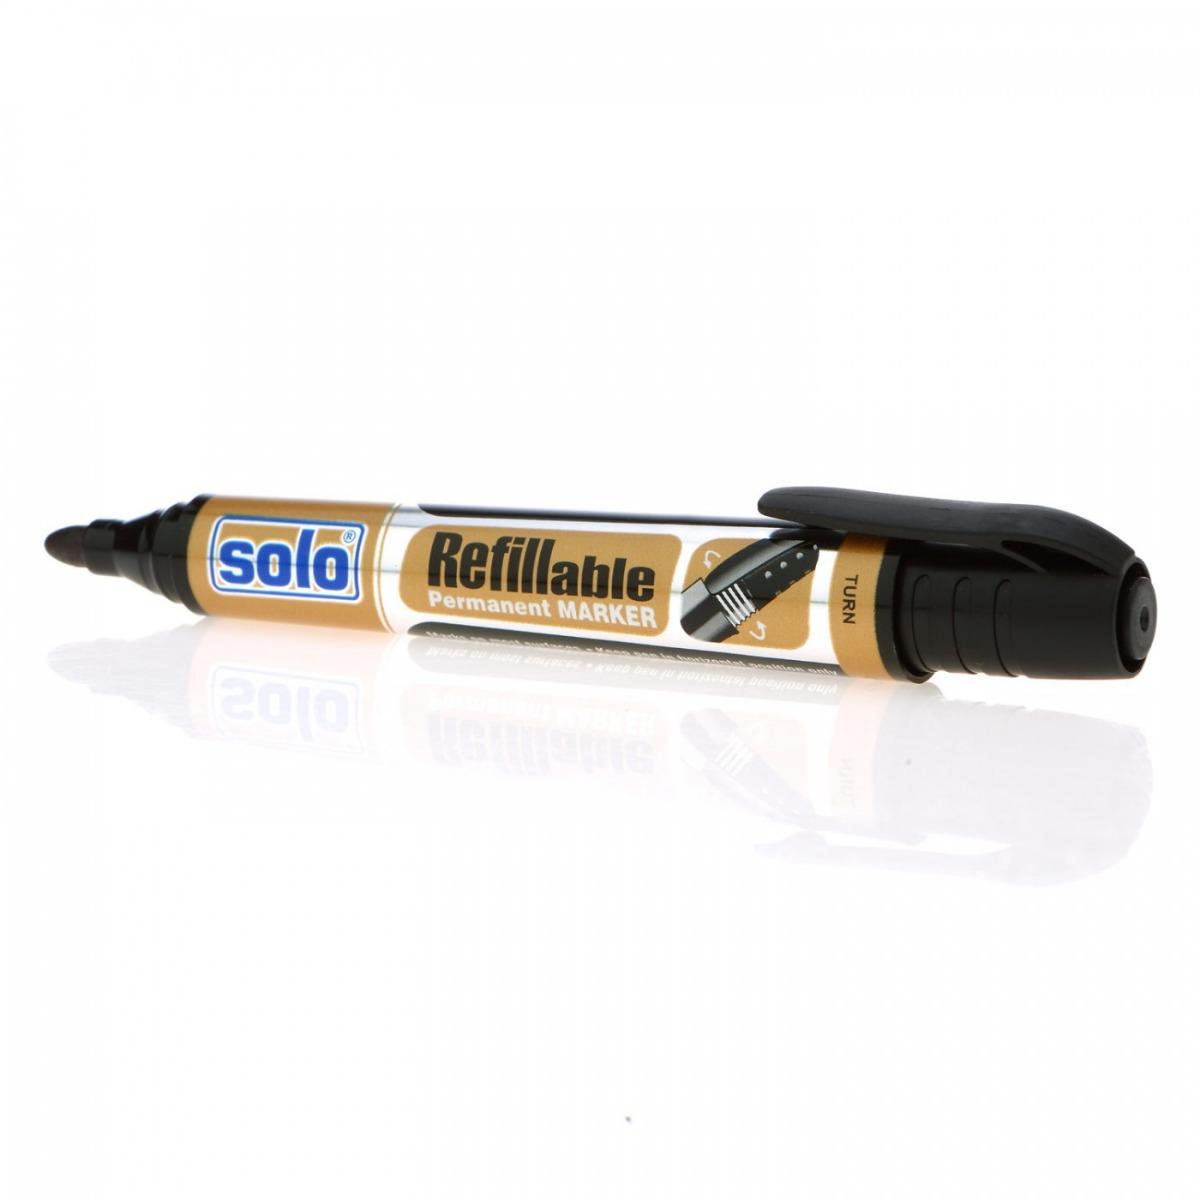 Refillable Permanent Marker Pen- Black, Pack of 10